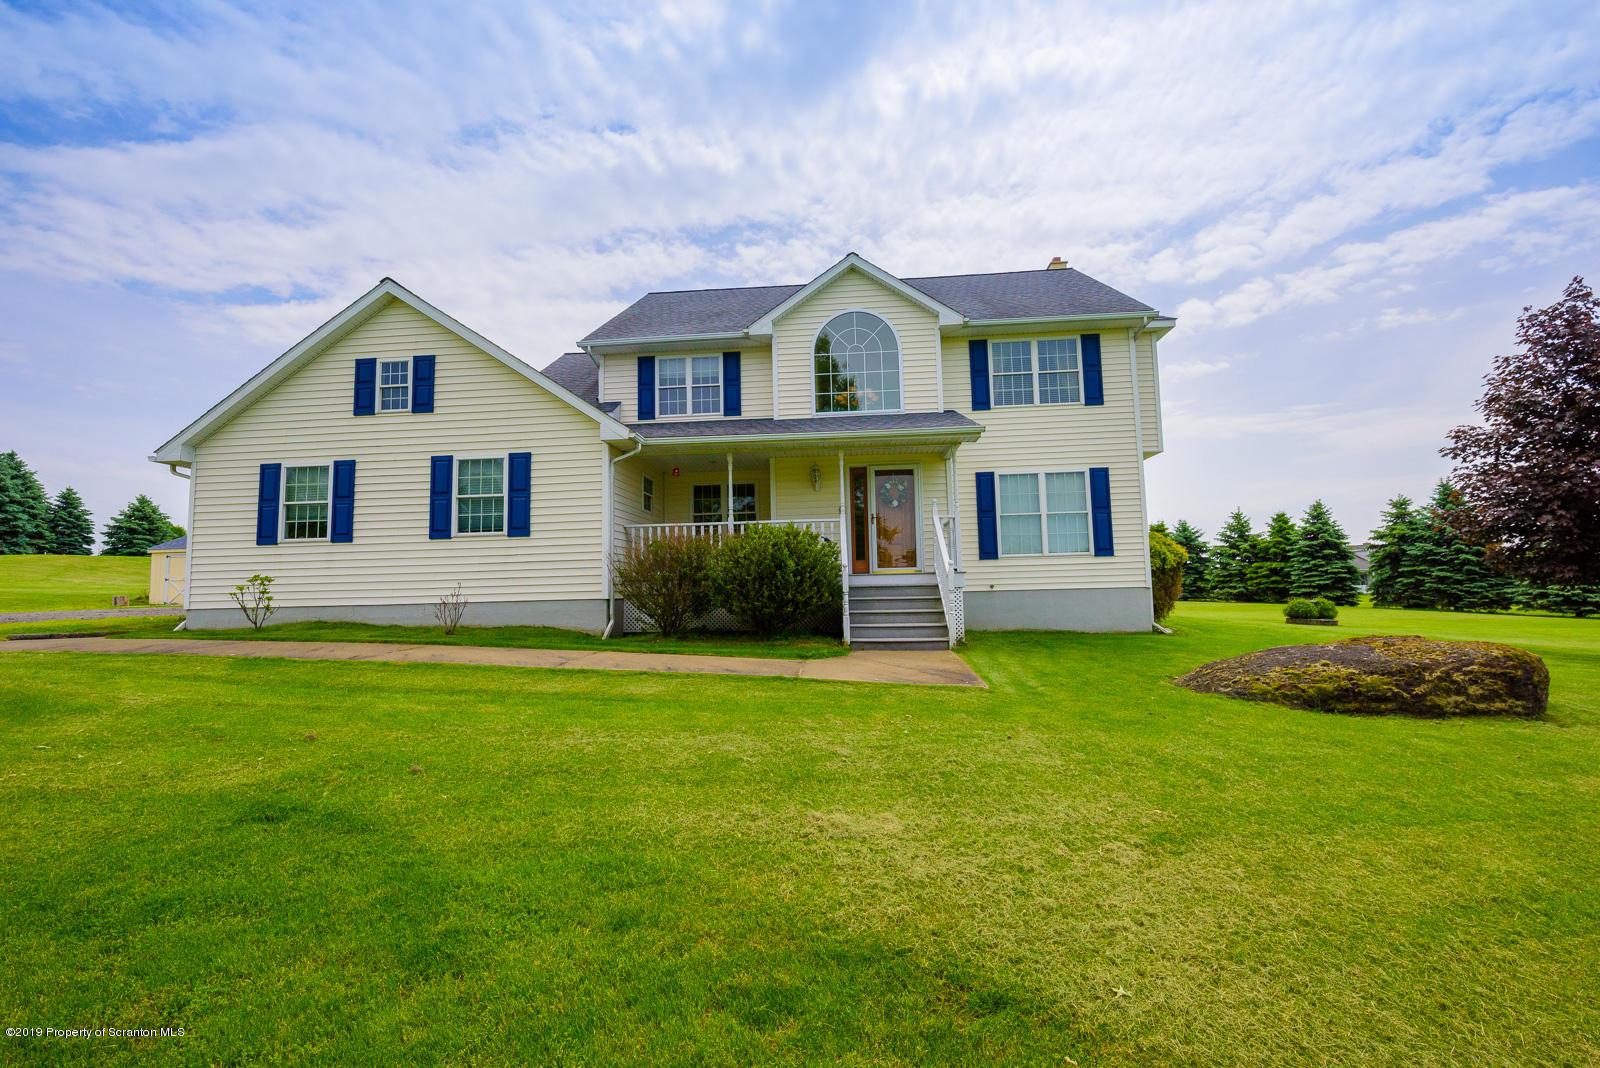 180 Spedding Farm Rd, Greenfield Twp, Pennsylvania 18407, 3 Bedrooms Bedrooms, 7 Rooms Rooms,3 BathroomsBathrooms,Single Family,For Sale,Spedding Farm,19-1644